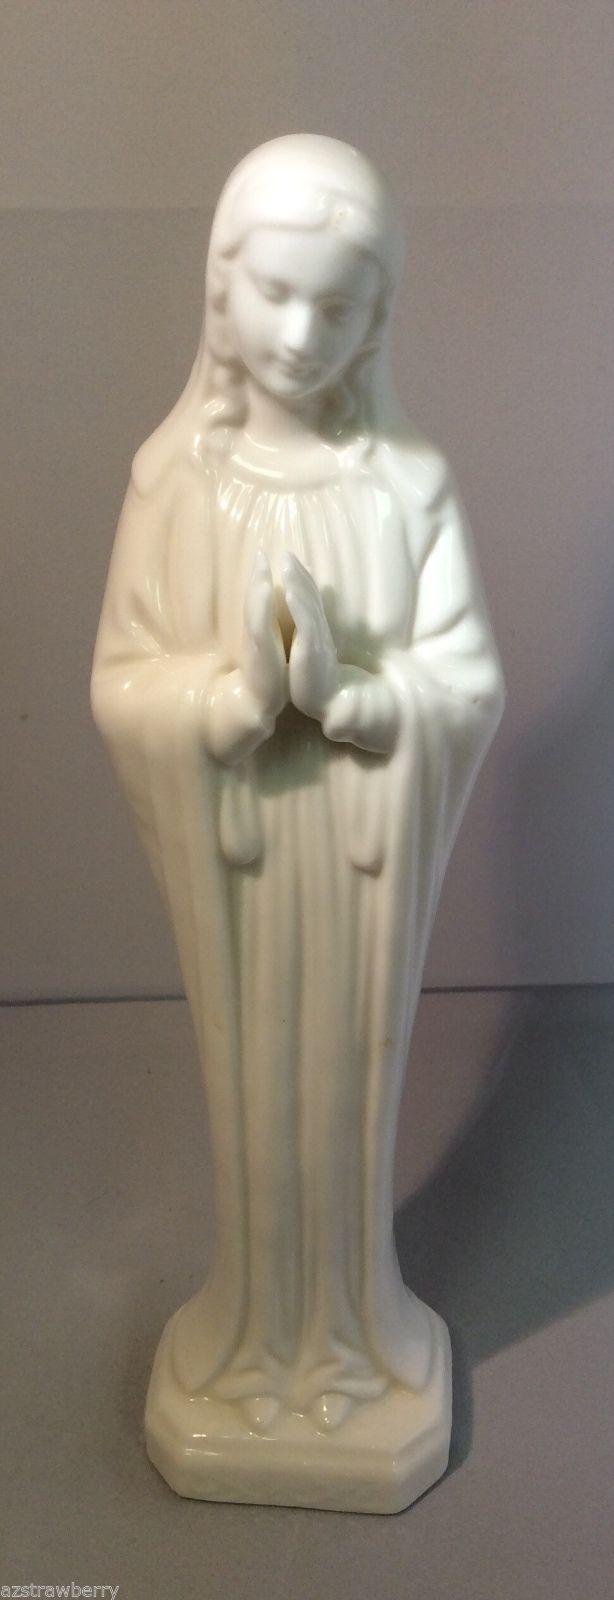 "VTG White Porcelain Bisque Praying Madonna Figurine 10"" tall"